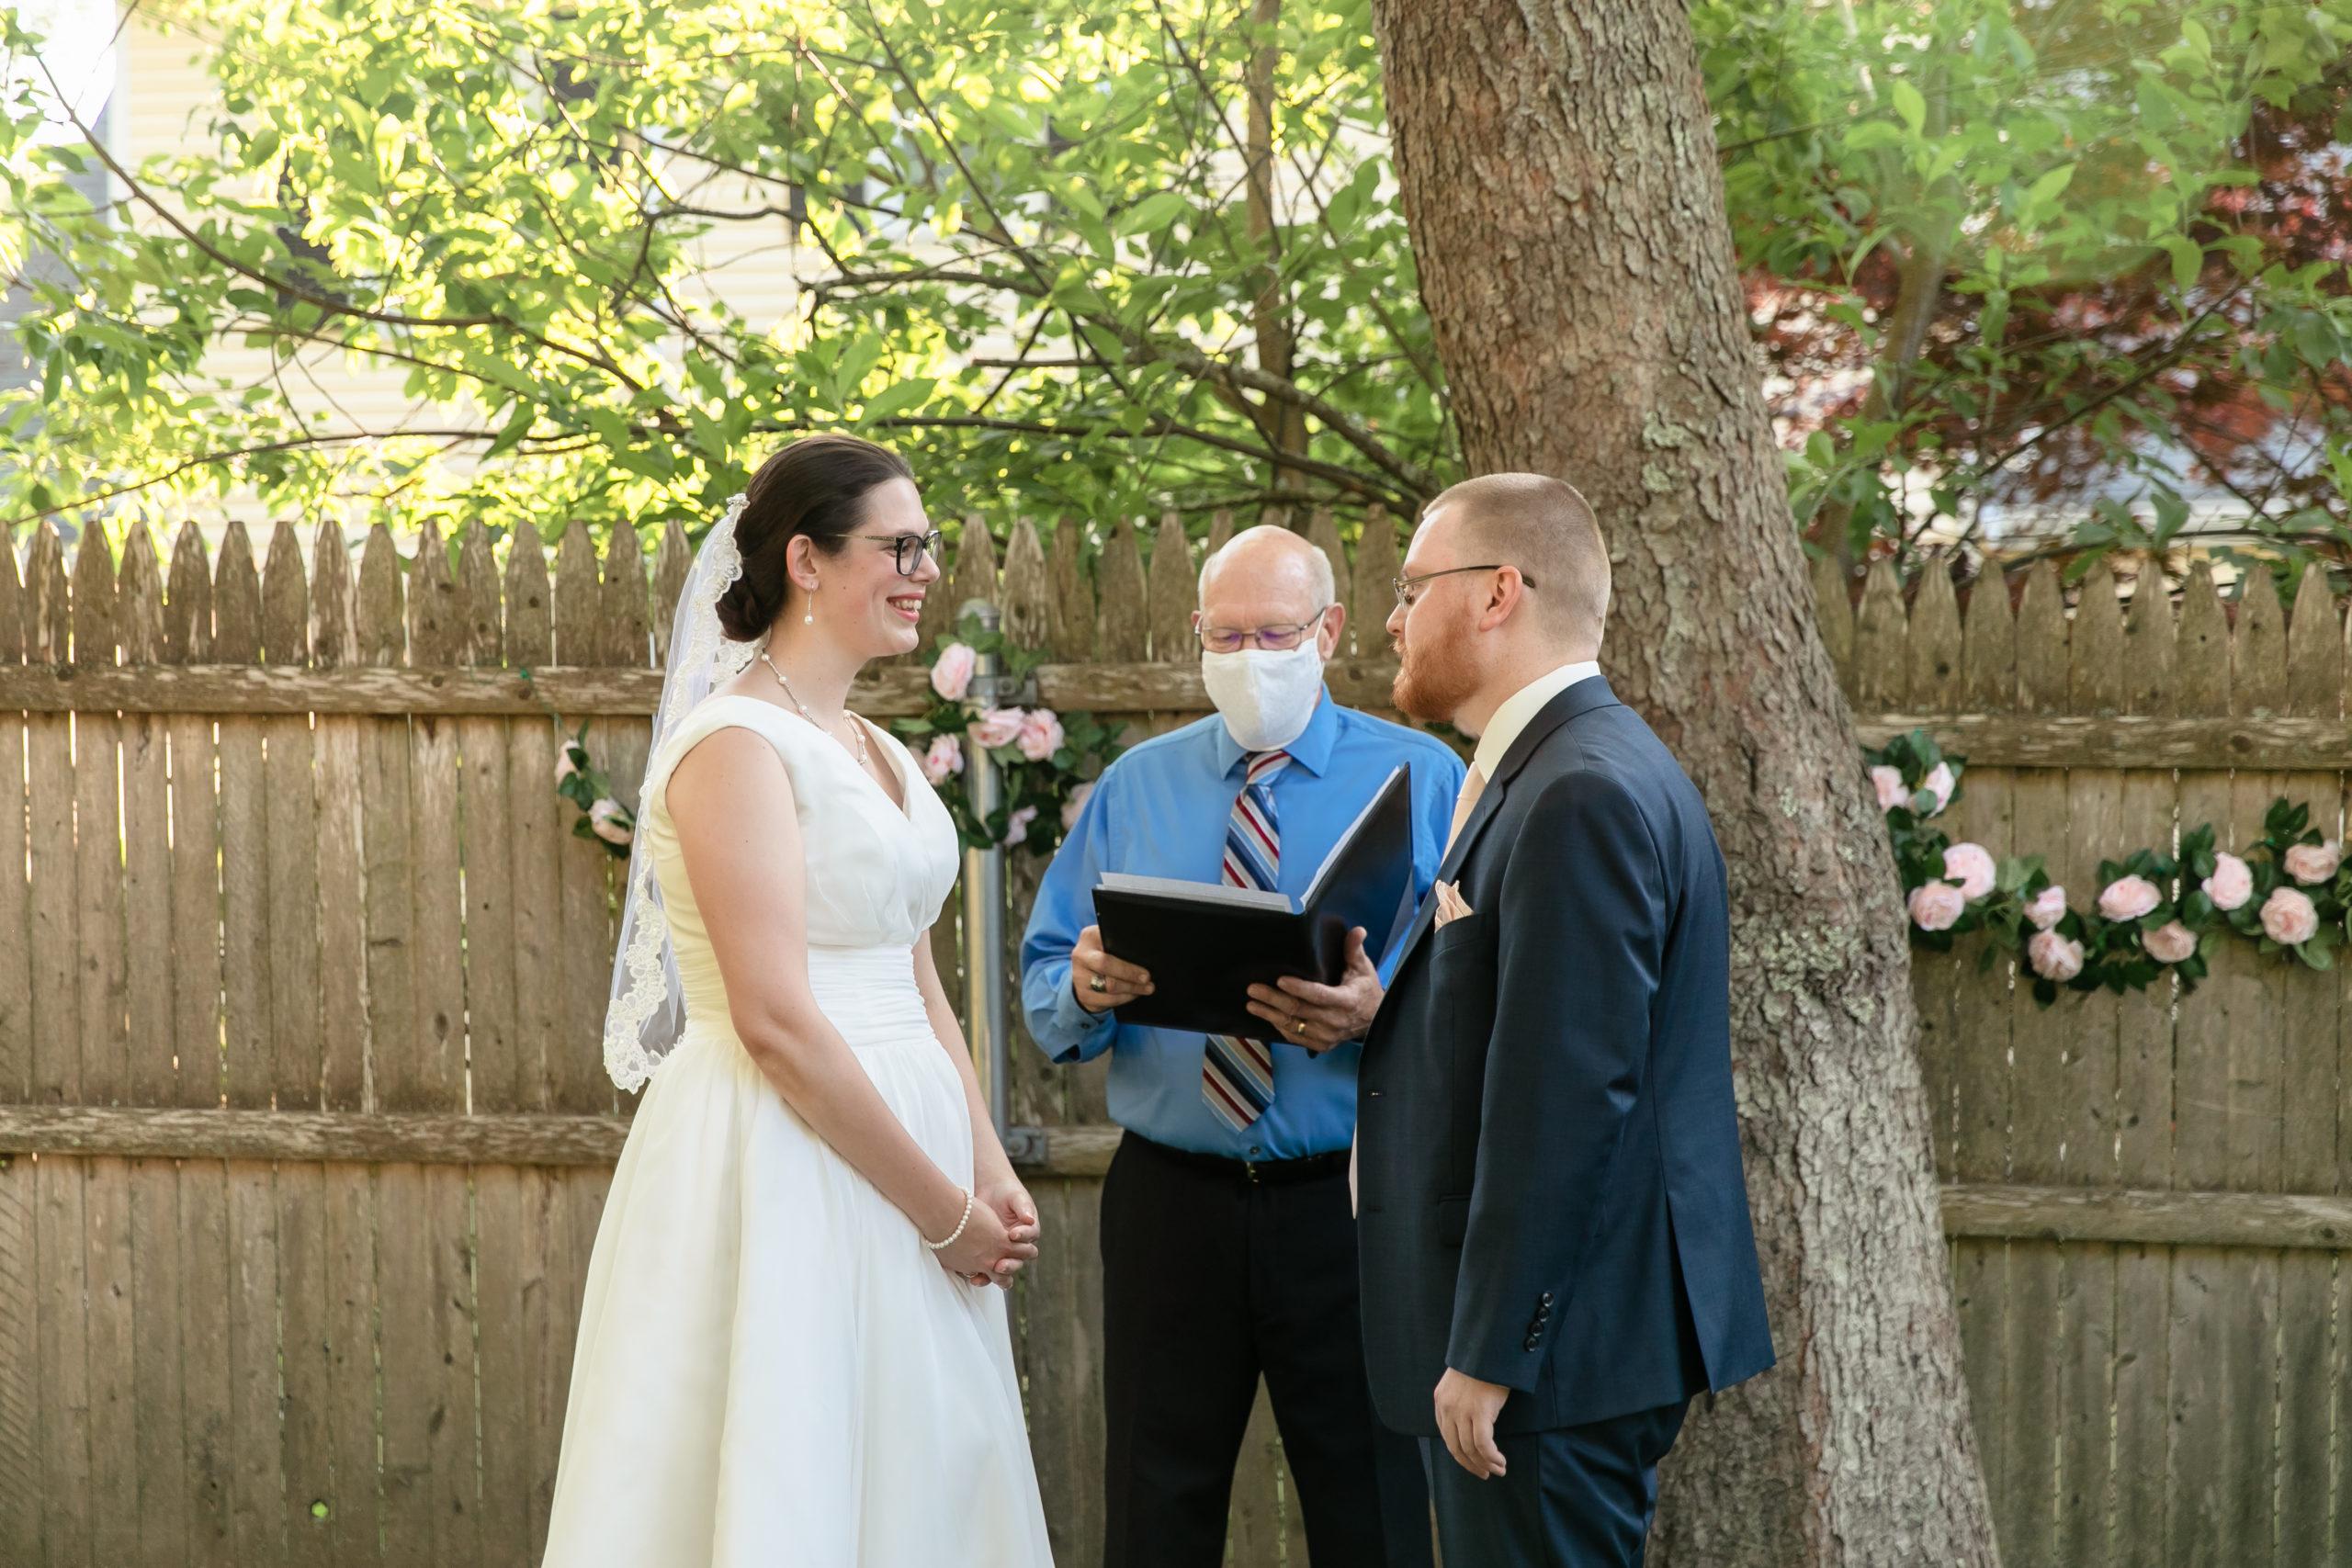 covid ceremony, Tracy jenkins photography, micro wedding